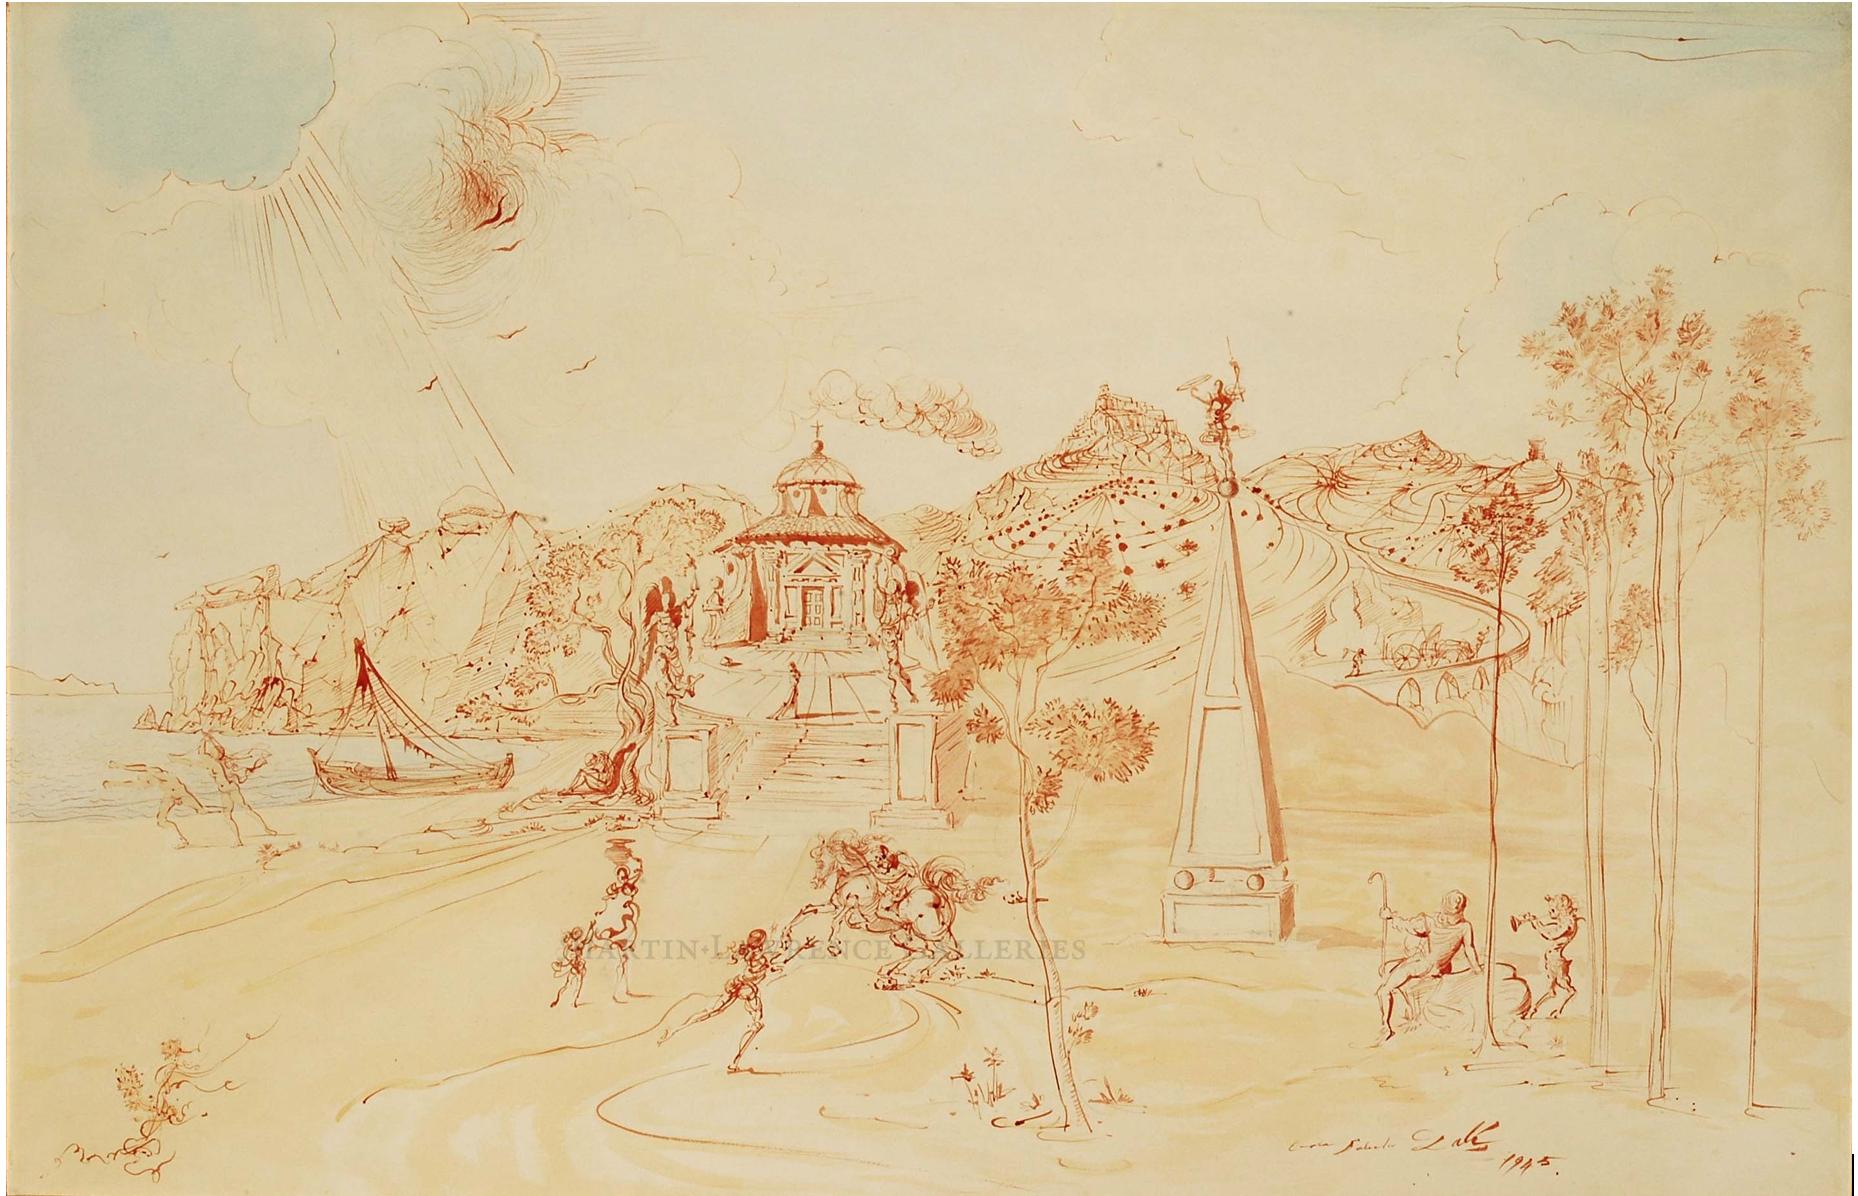 Salvador Dalí, Sans Titre (scène méditerranéenne), 1945 1945 watercolor, brush, pen and red ink on paper laid down on card; signed and dated 'Gala Salvador Dalí 1945' image size/ 25.75 x 39.25